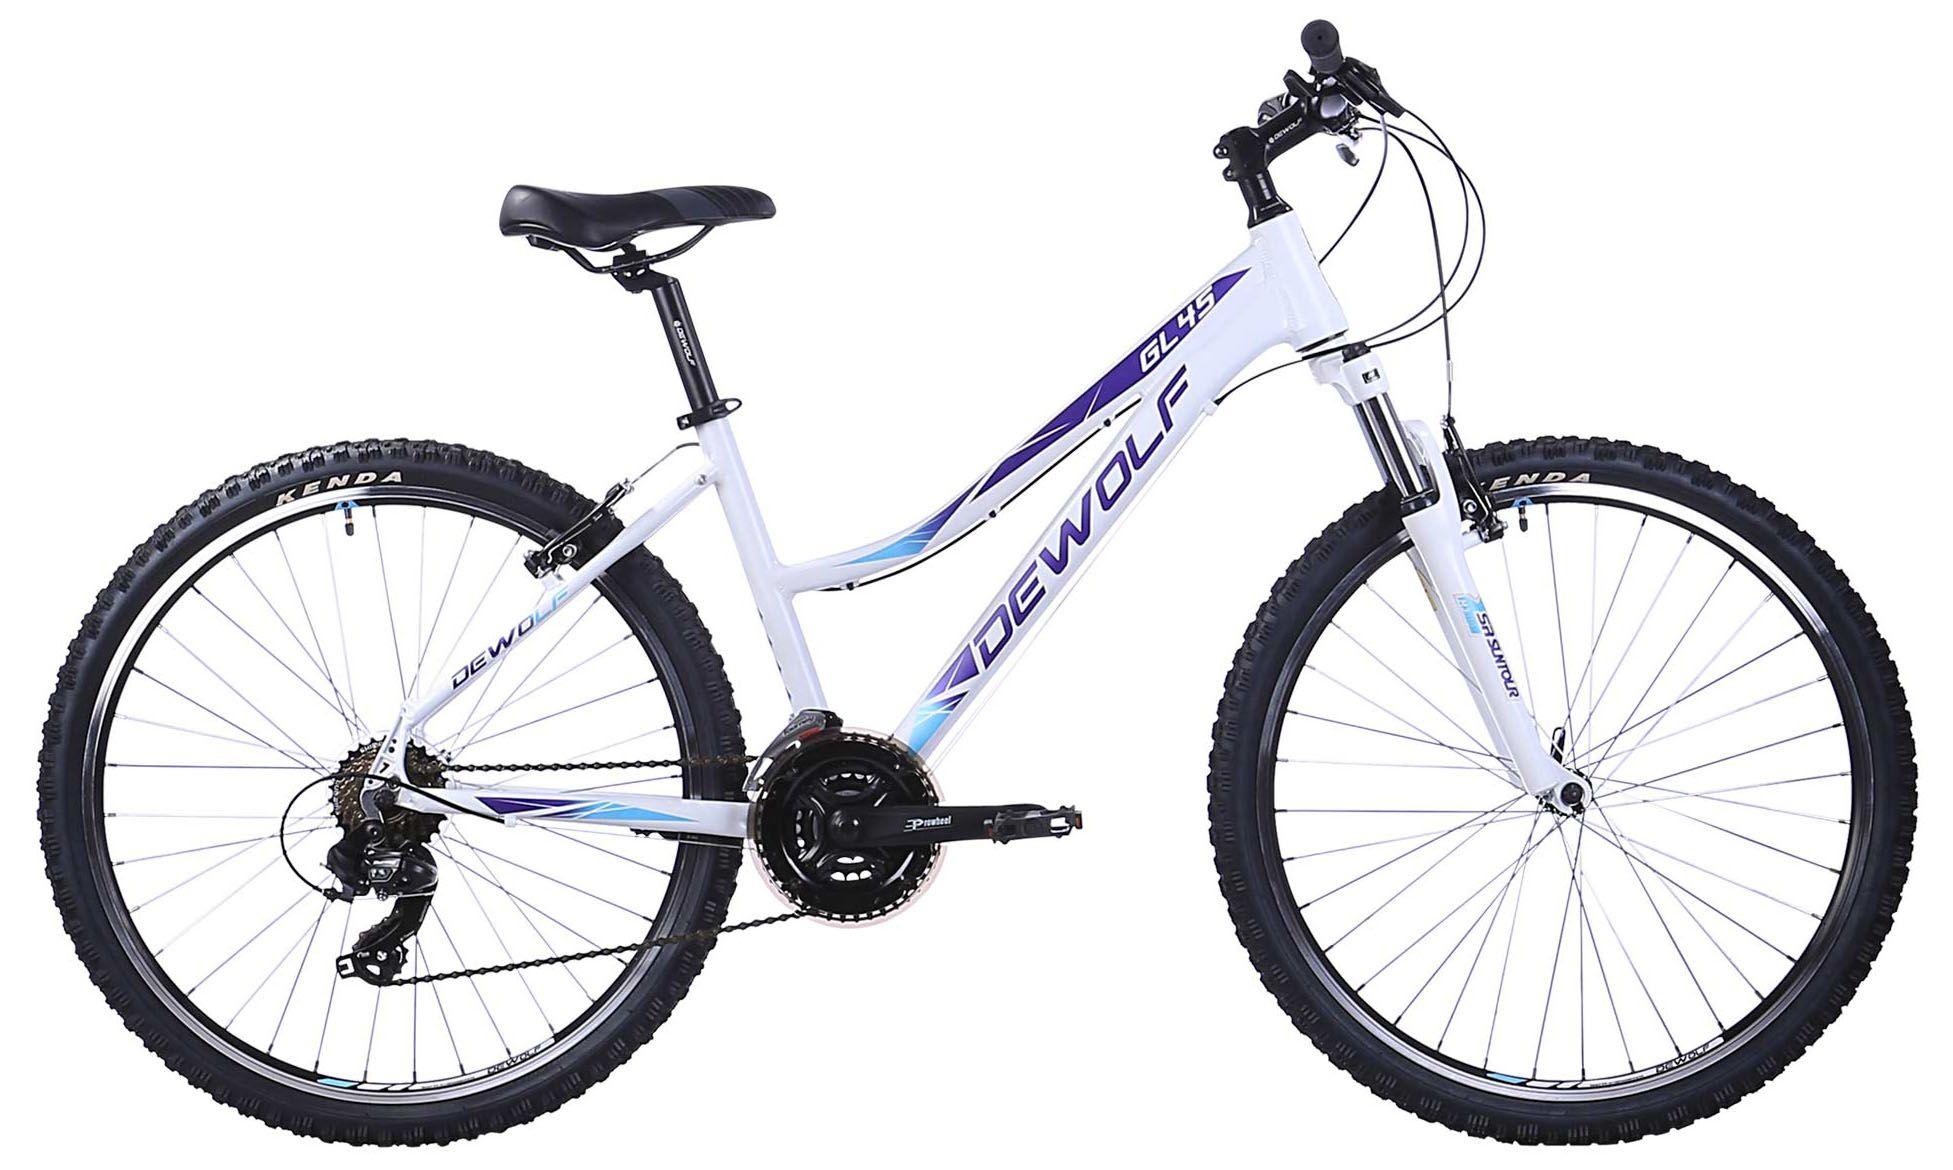 Велосипед Dewolf GL 45 2018 велосипед dewolf wave 210 2018